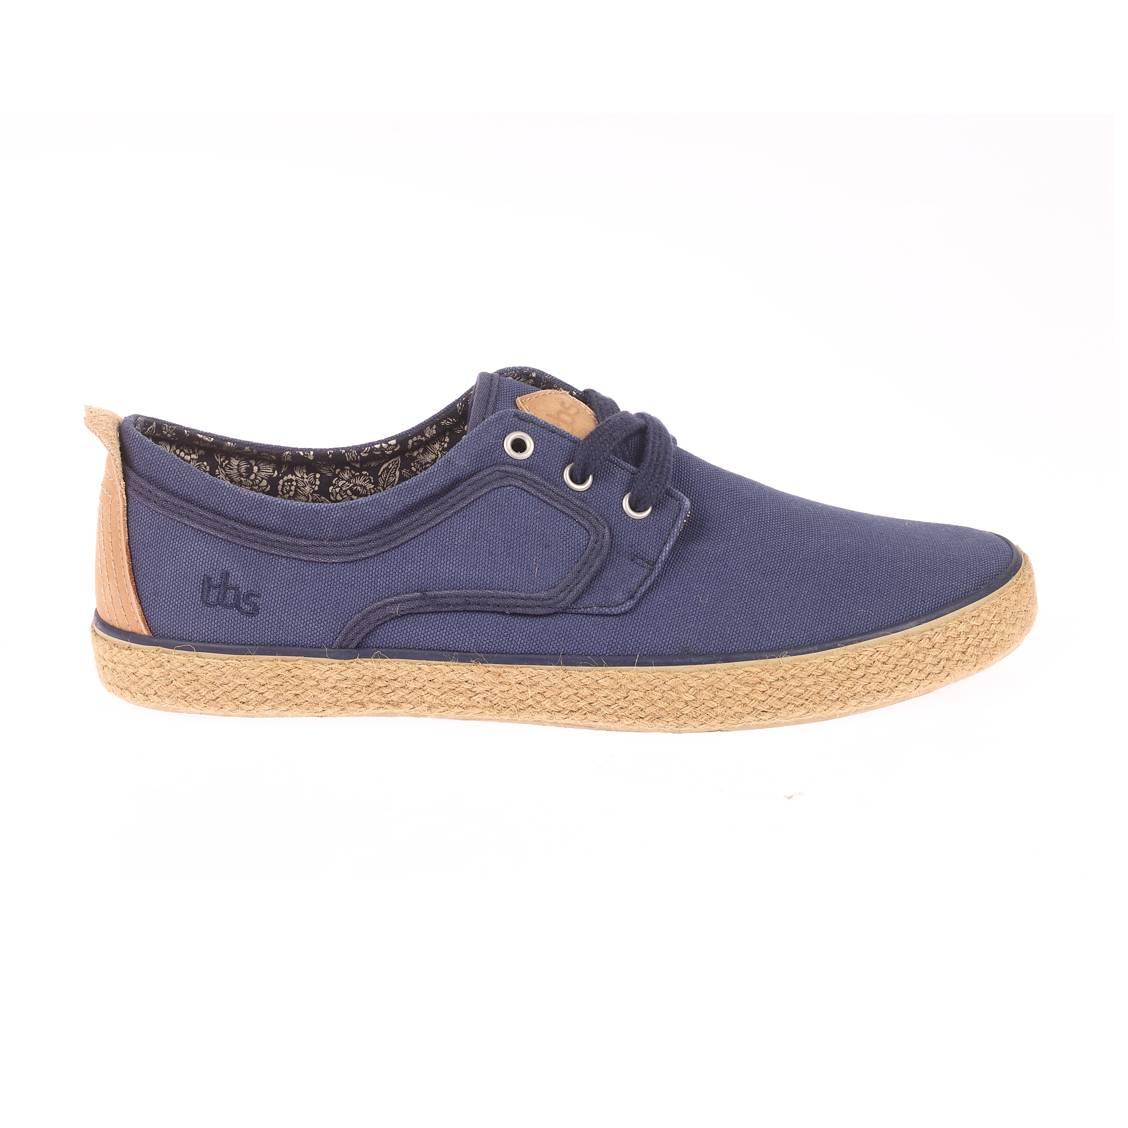 Baskets TBS en toile bleu de prusse. Chaussures TBS  - Extérieur en toile bleu de prusse - Doublure intérieure bleu marine à moti